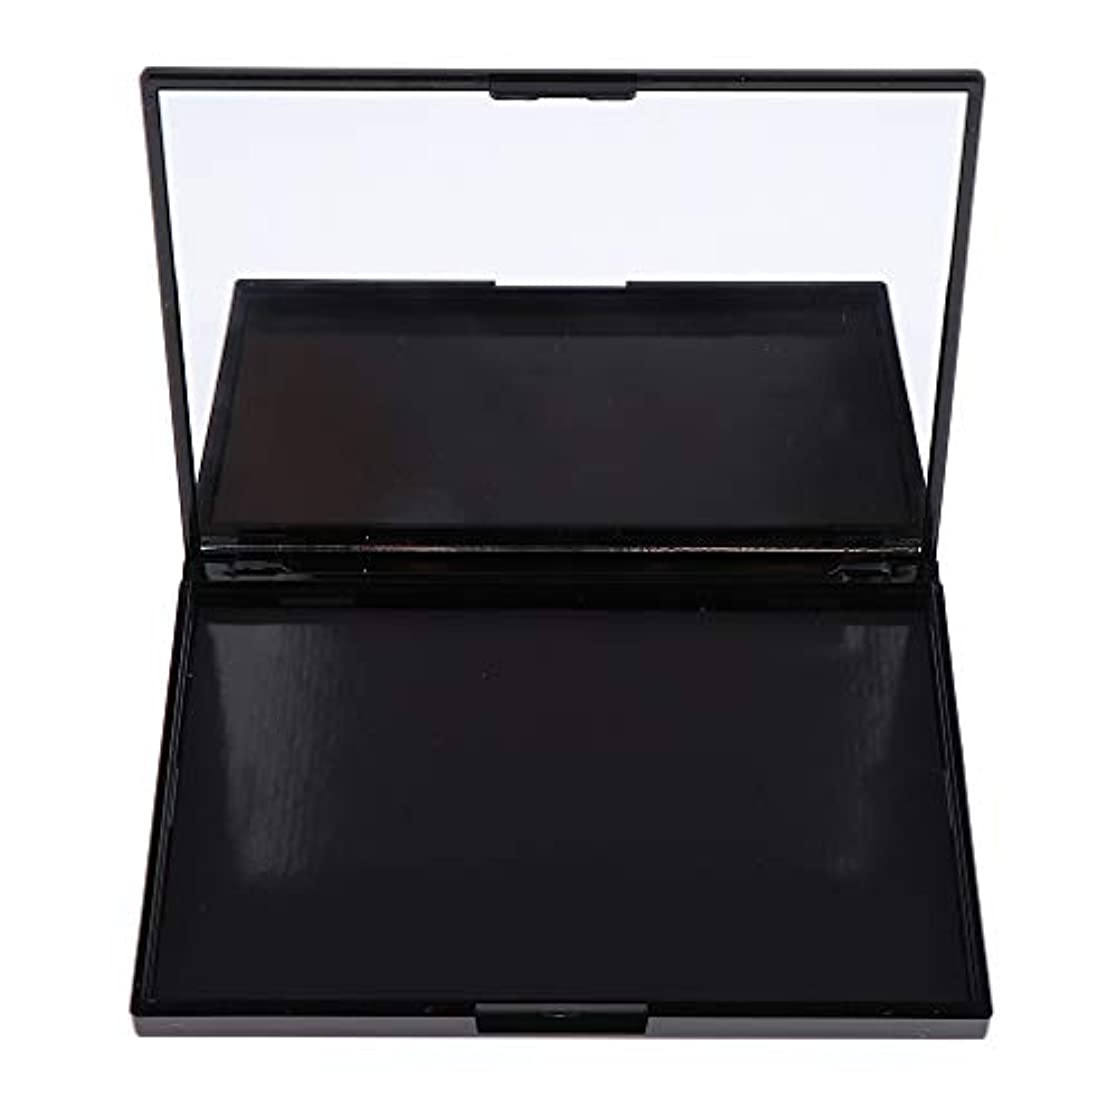 B Blesiya アイシャドウパレット 磁気パレット DIY 収納ケース ミラー付き 可愛い 3タイプ選べ - ローズフラワー